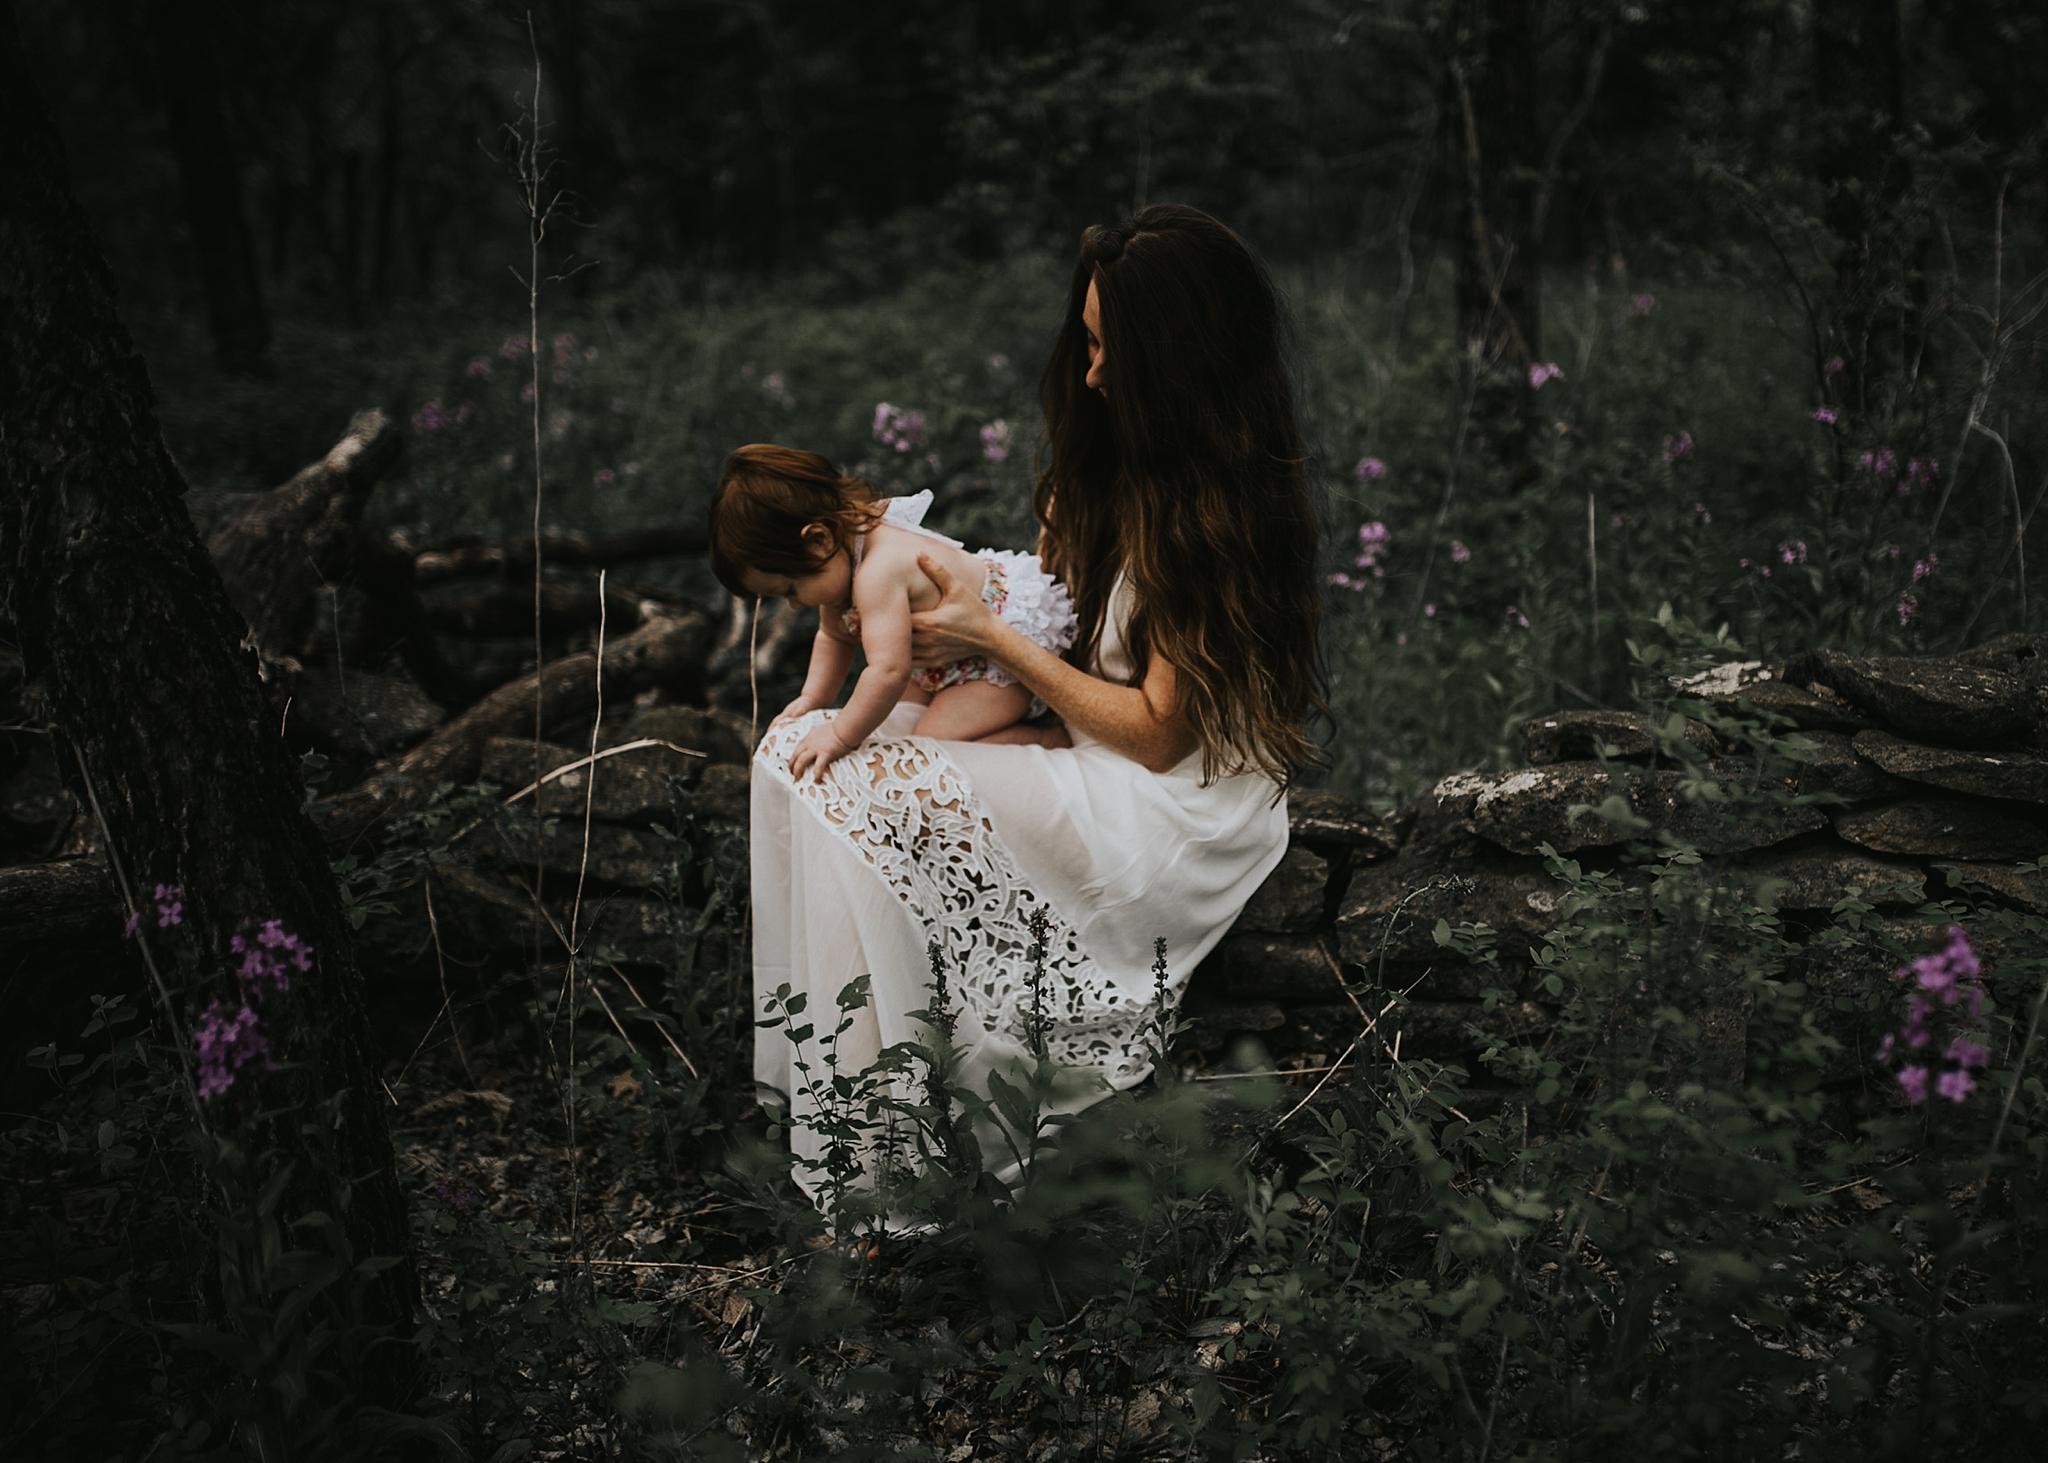 twyla jones photography - mother daughter - field and forest-4729_treasure coast florida.jpg